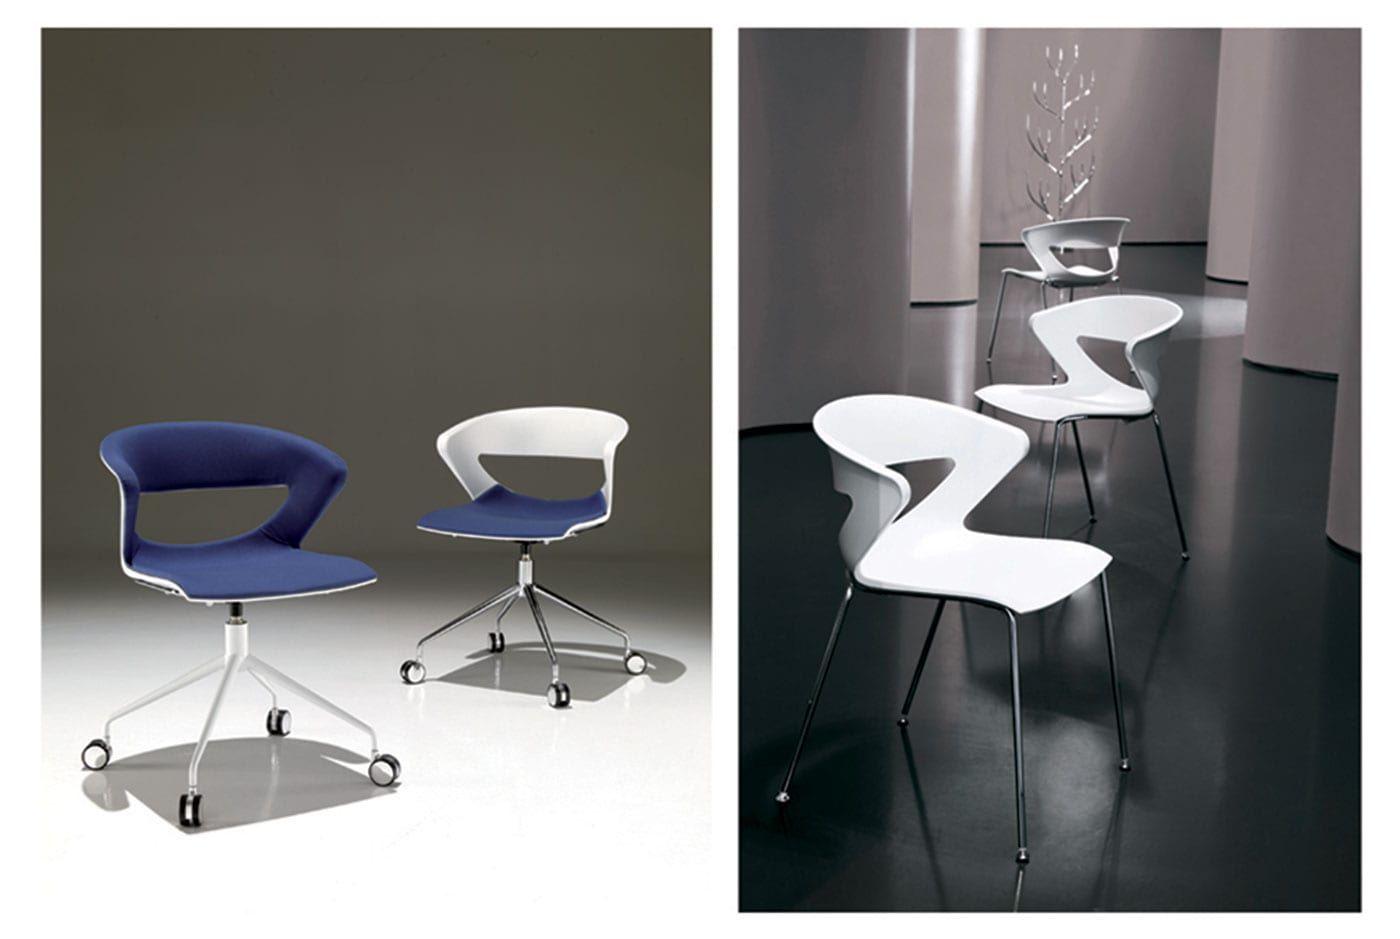 Sedie per ufficio Kikka - IVM Office | Sedia per ufficio ...